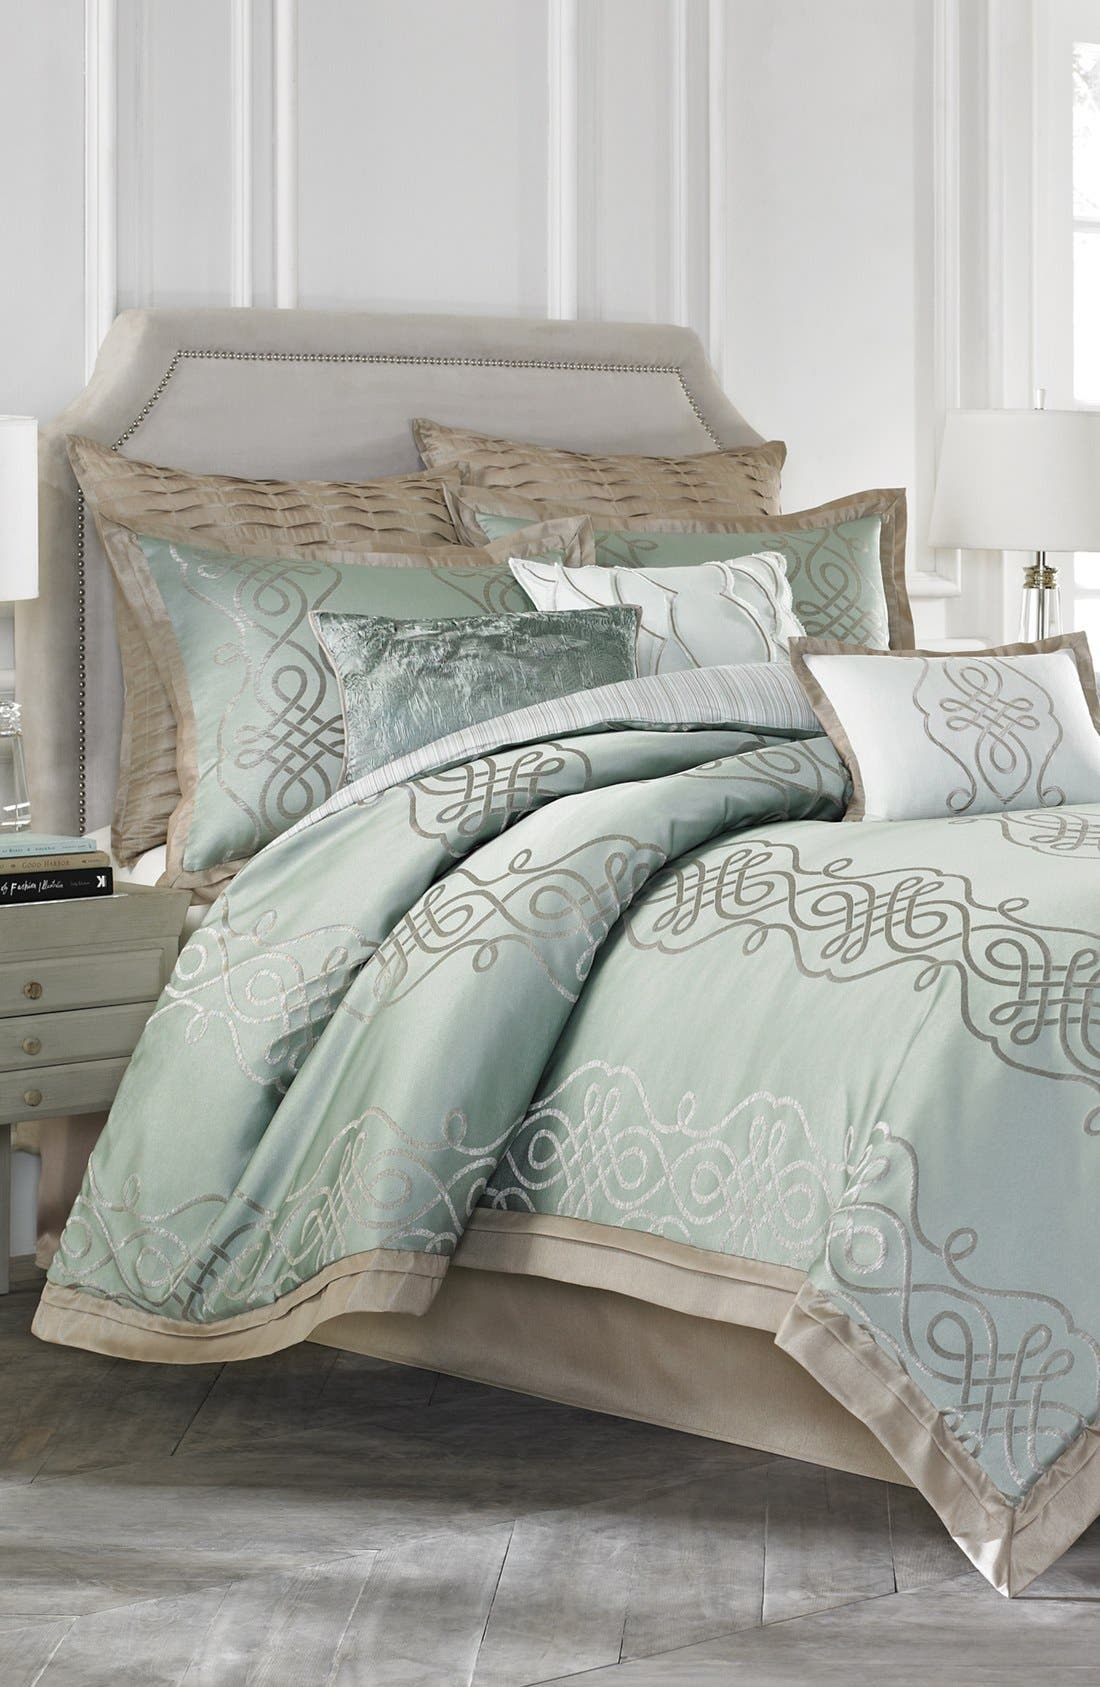 Alternate Image 1 Selected - Vince Camuto 'Copenhagen' Comforter Set